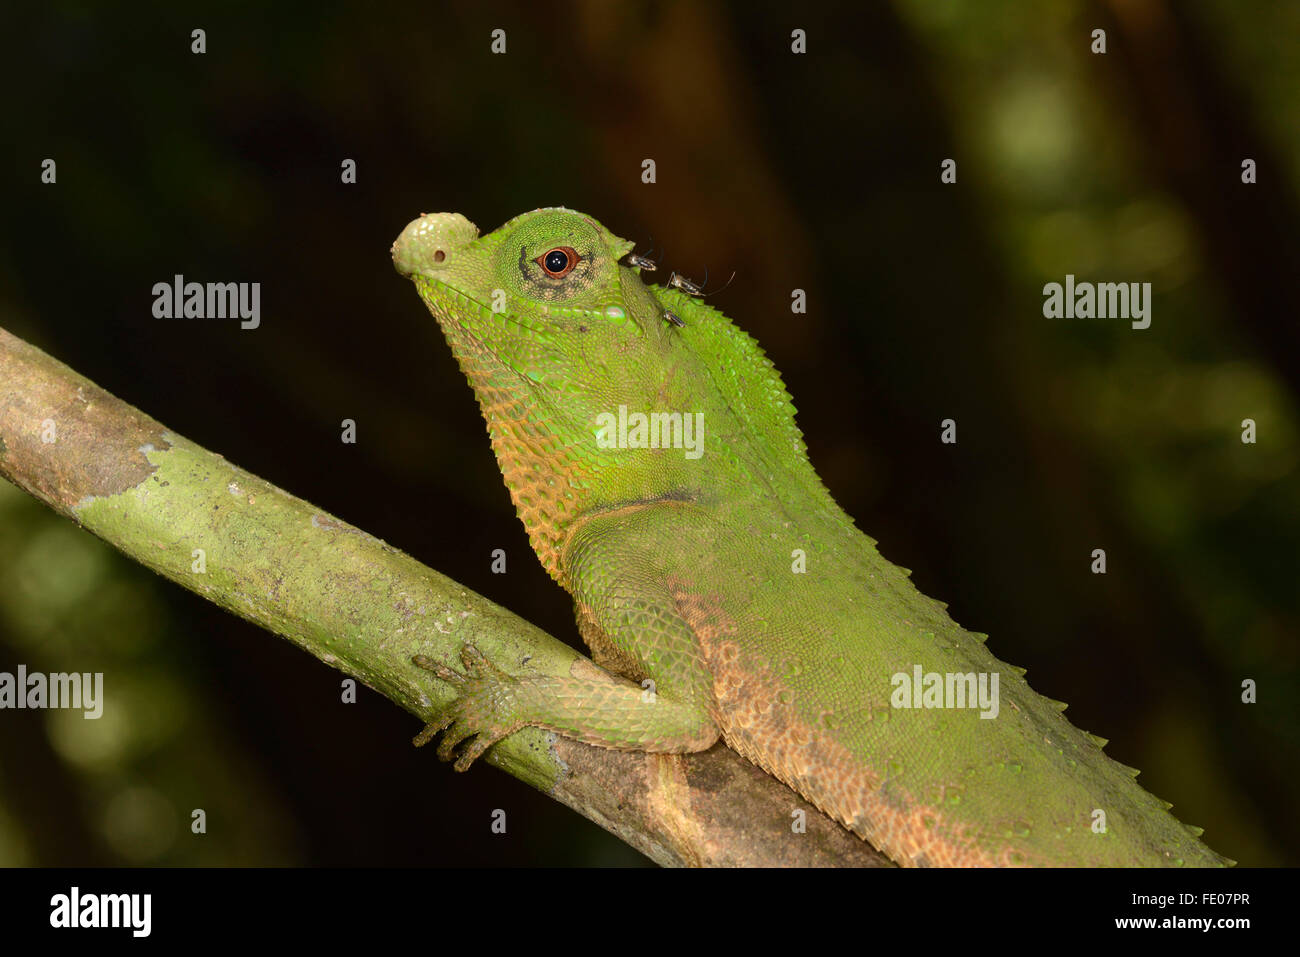 Hump Snout or Hump-nosed Lizard (Lyriocephalus scutatus) portrait, Sinharaja Forest Reserve, Sri Lanka, March - Stock Image